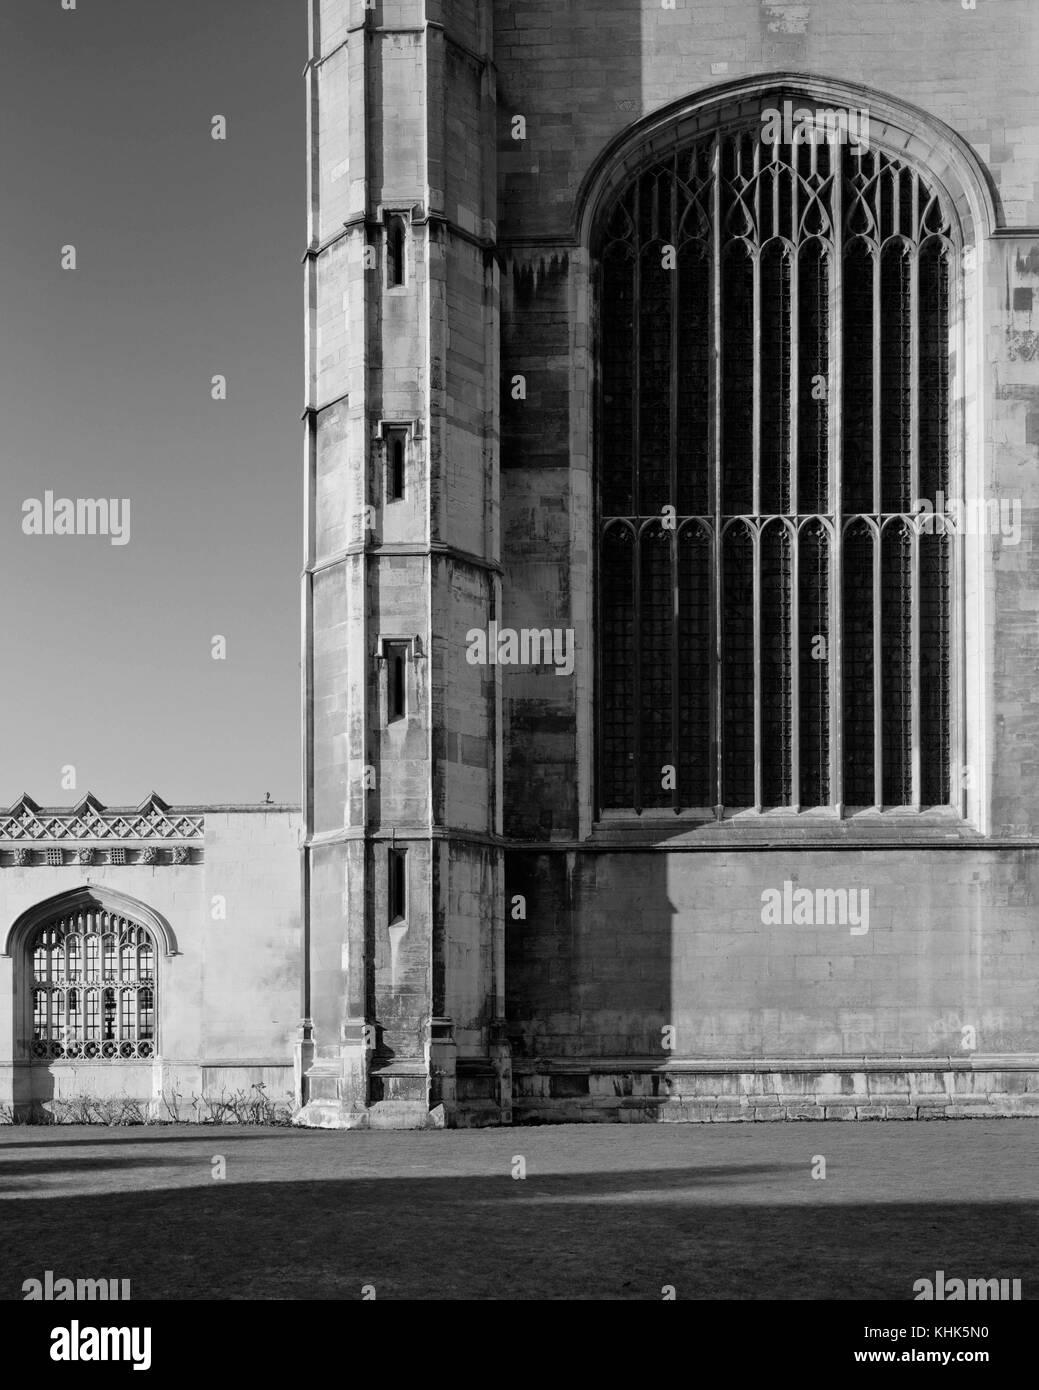 King's College Chapel Cambridge - Stock Image